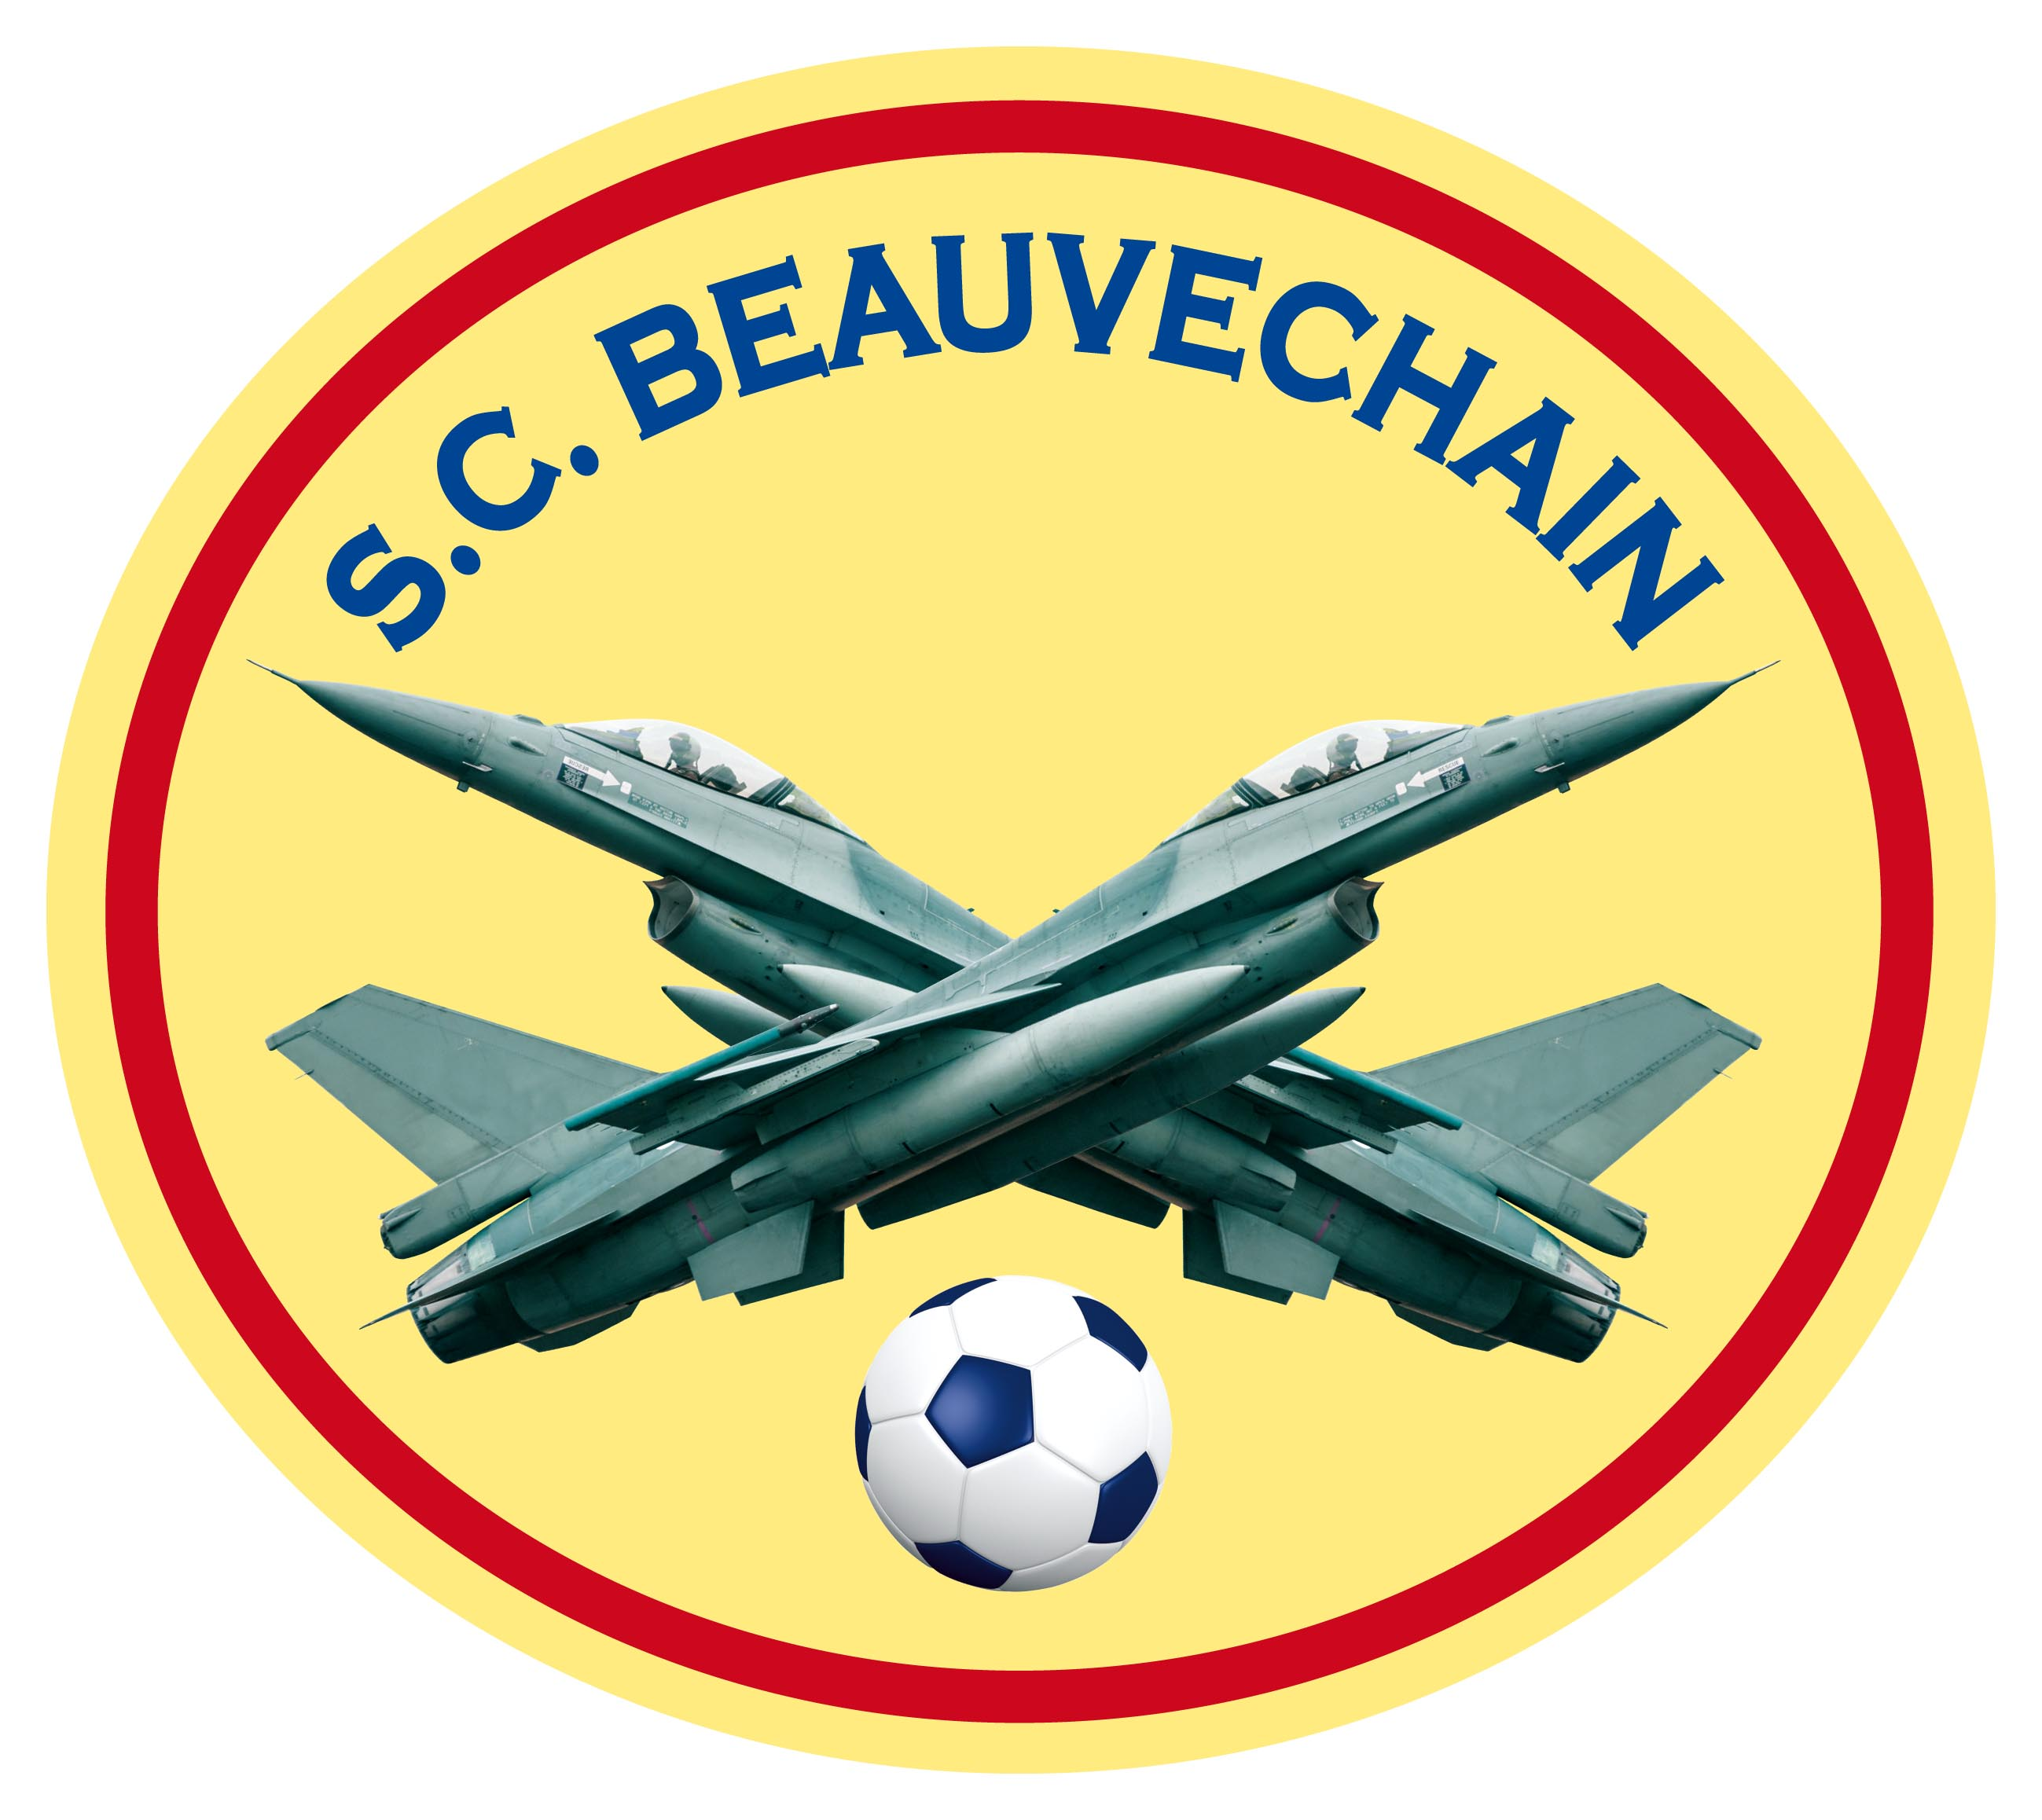 4 - SC.Beauvechain